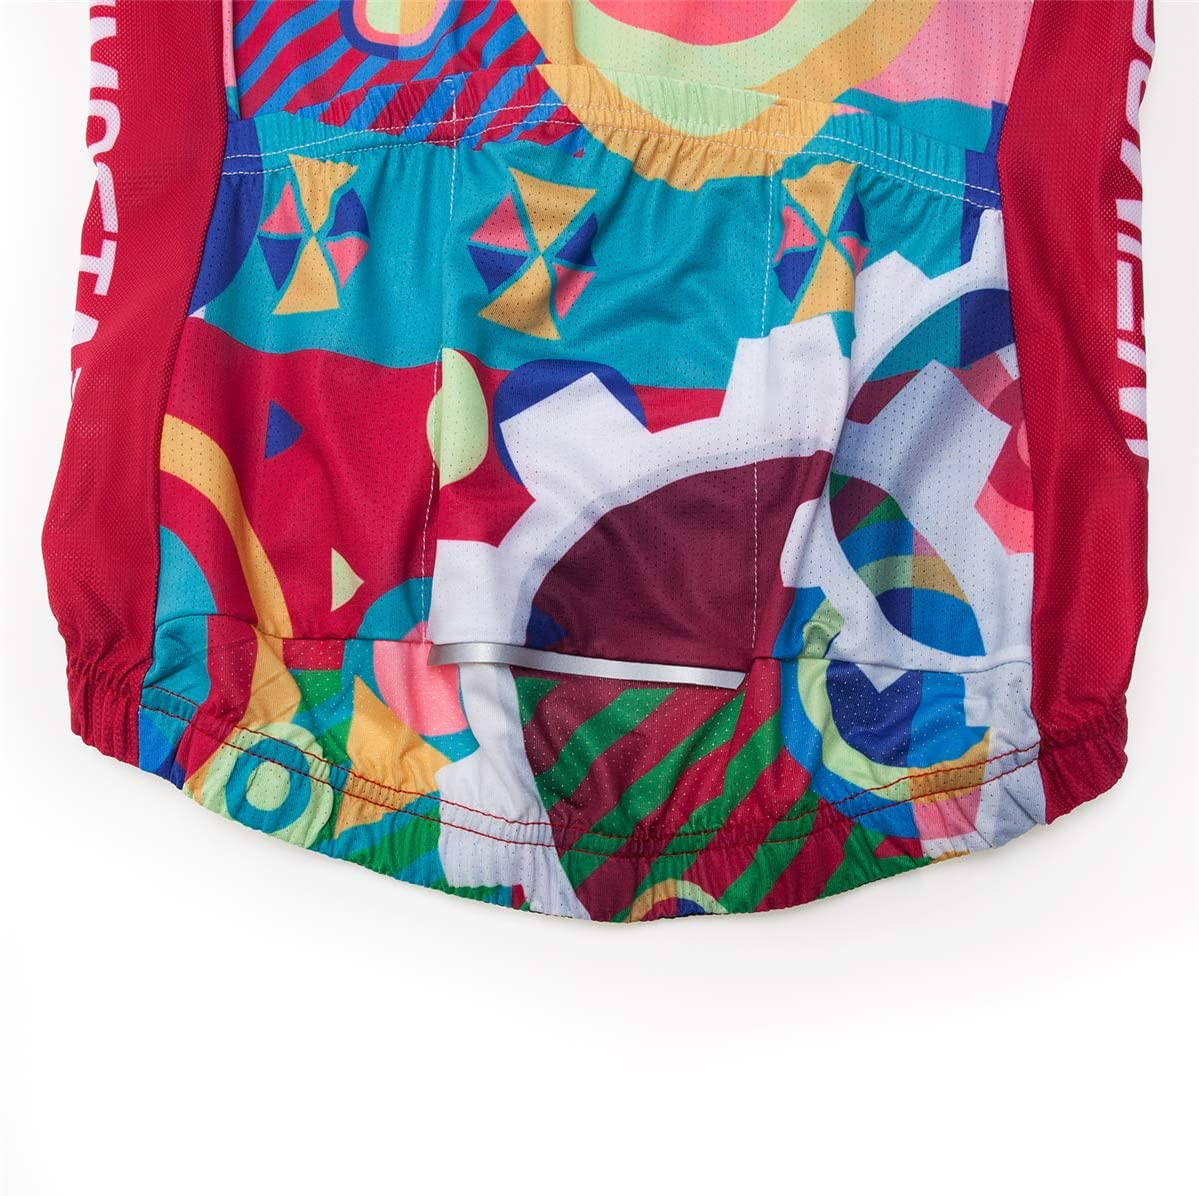 Weimostar Radfahren Jersey Frauen M/ädchen MTB Jersey Bike Tops Shirt Mountain Fahrrad Kleidung